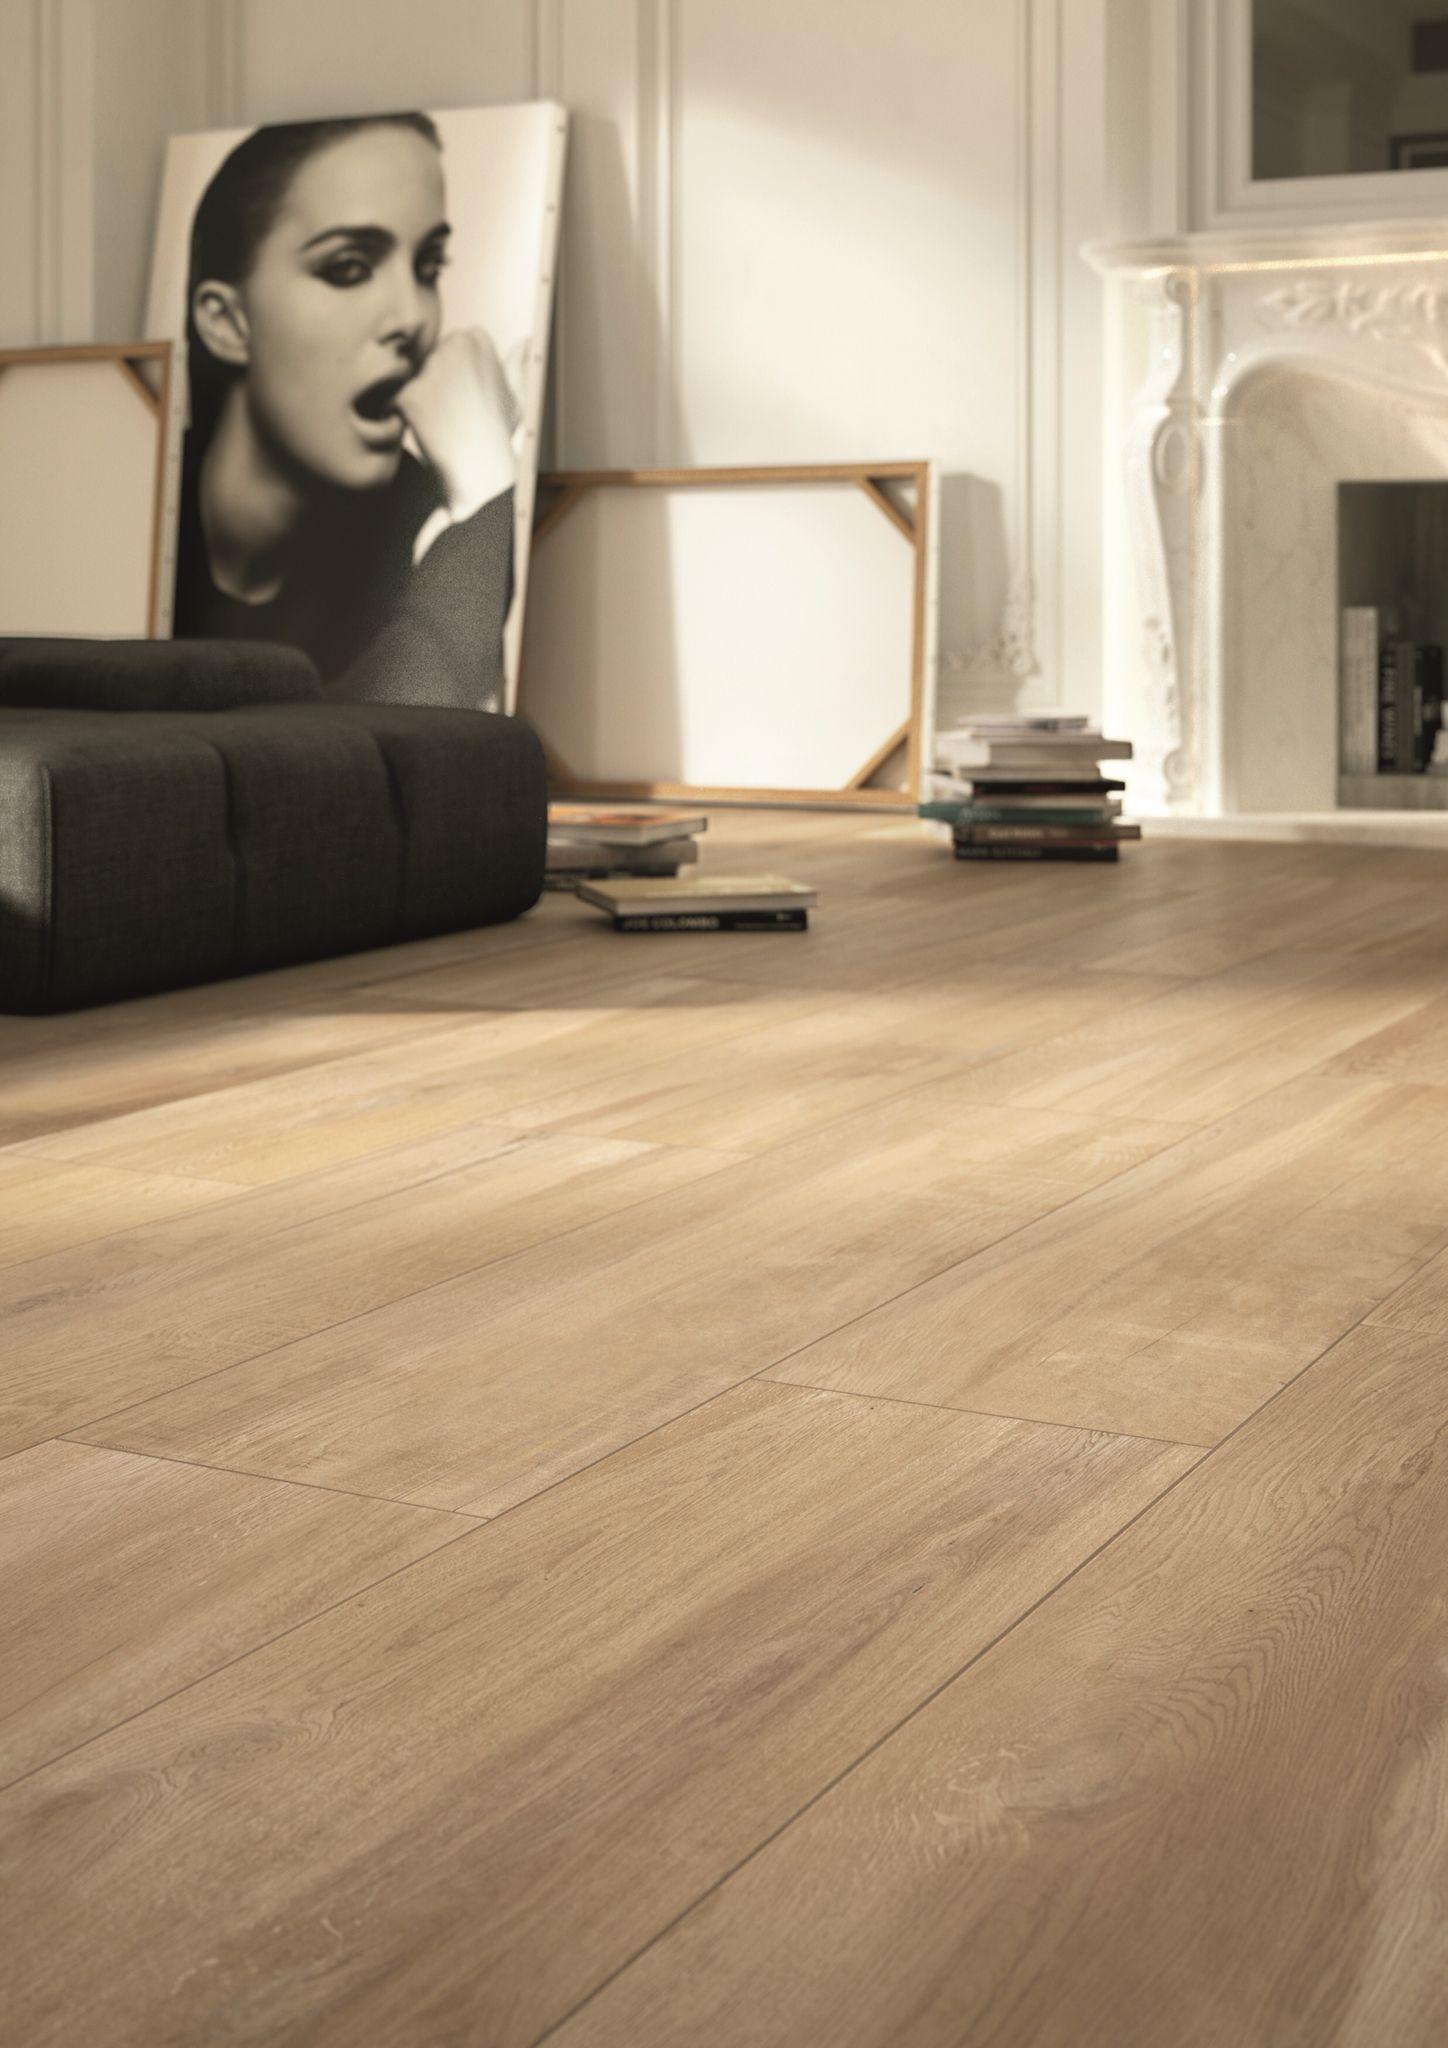 Argenteno Maple Porcelain Planks Stunning wood effect